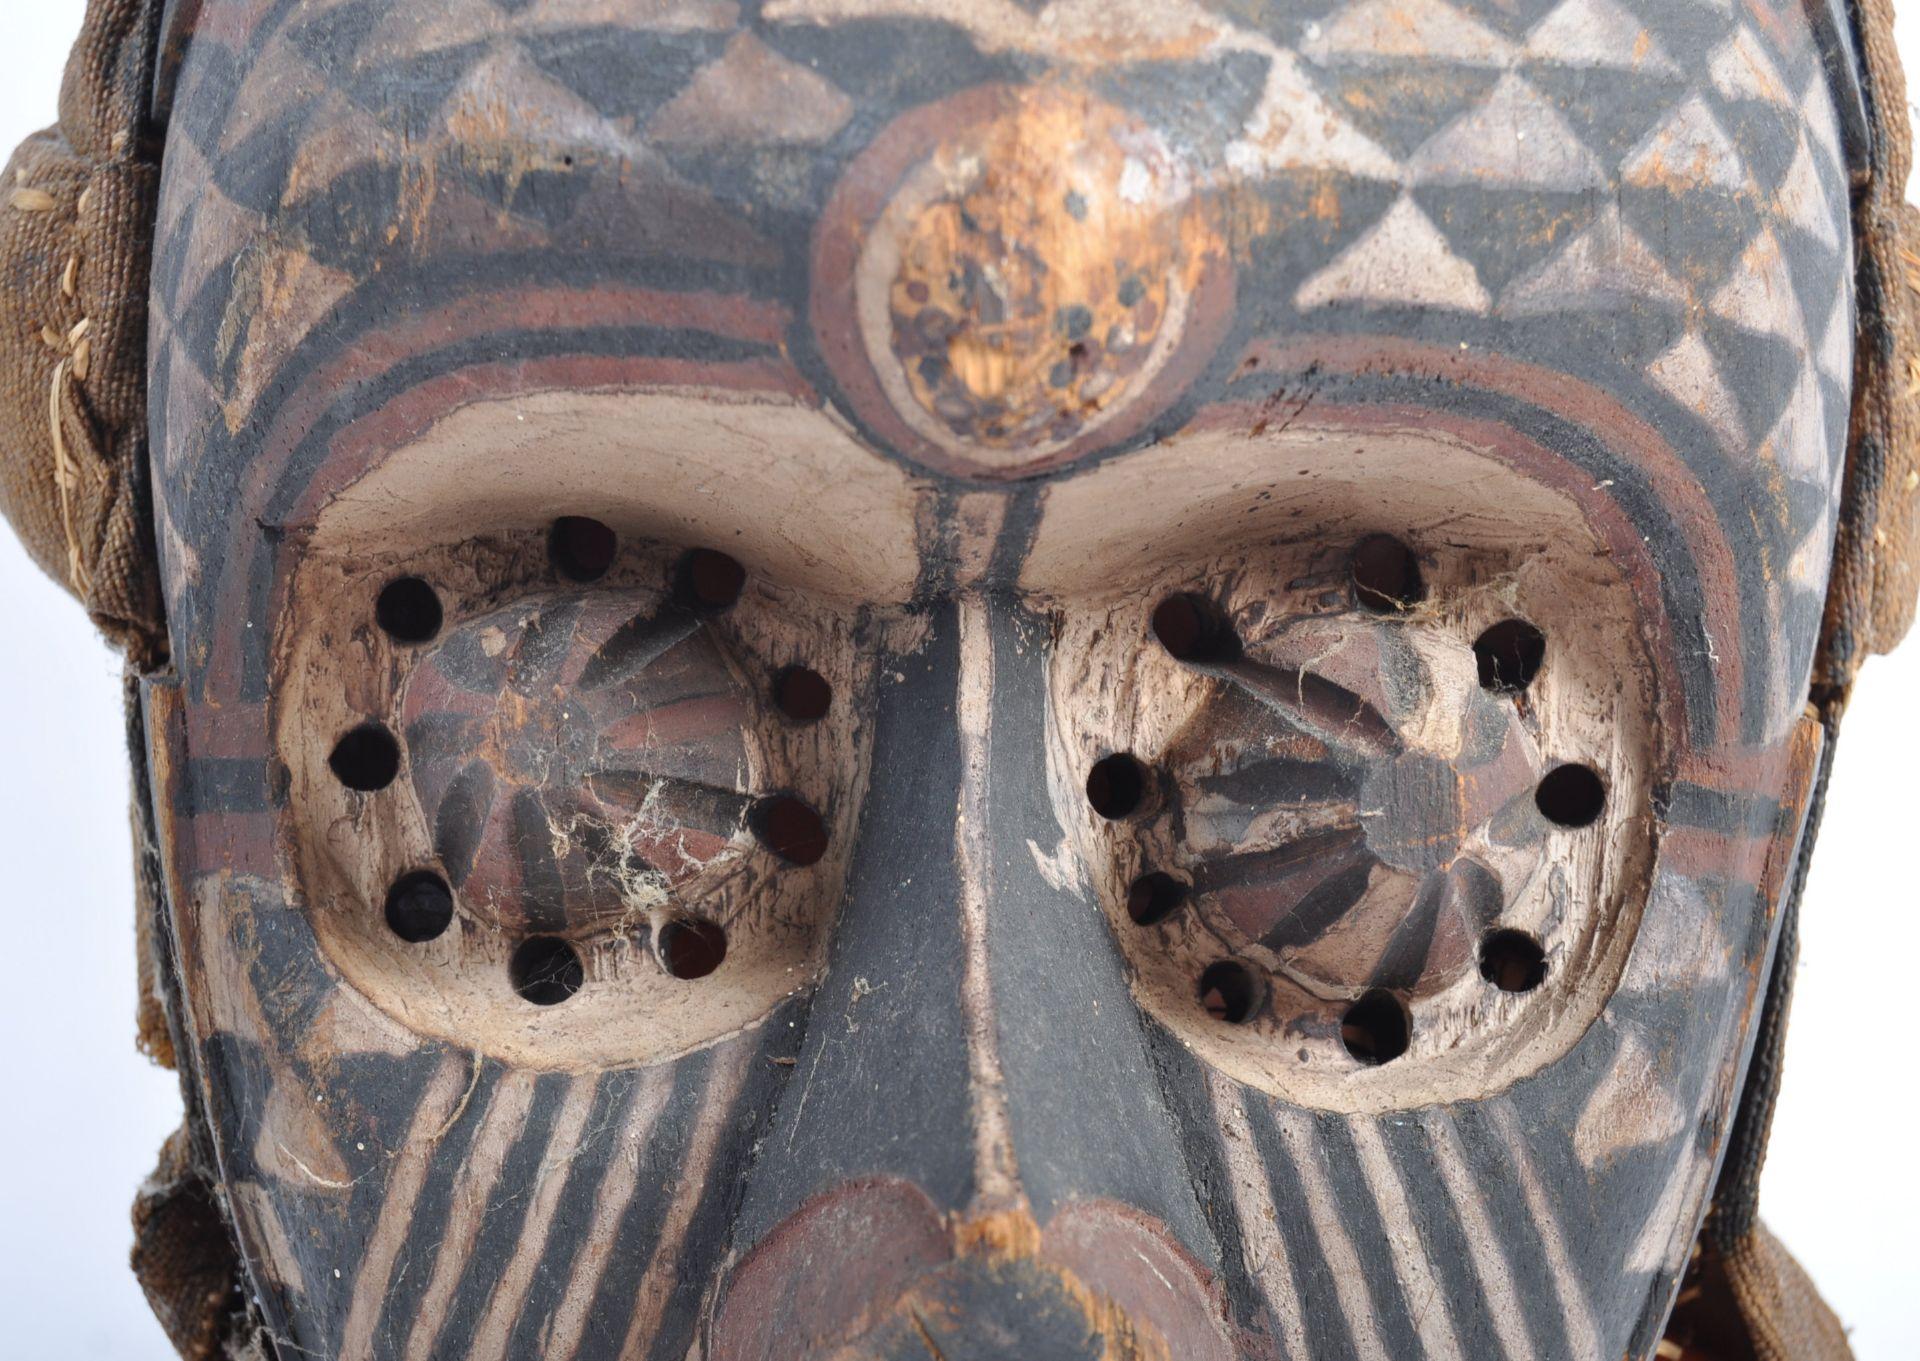 Los 385 - TRIBAL ANTIQUITIES - 19TH CENTURY CONGOLESE KUBA PWOOM ITOK MASK